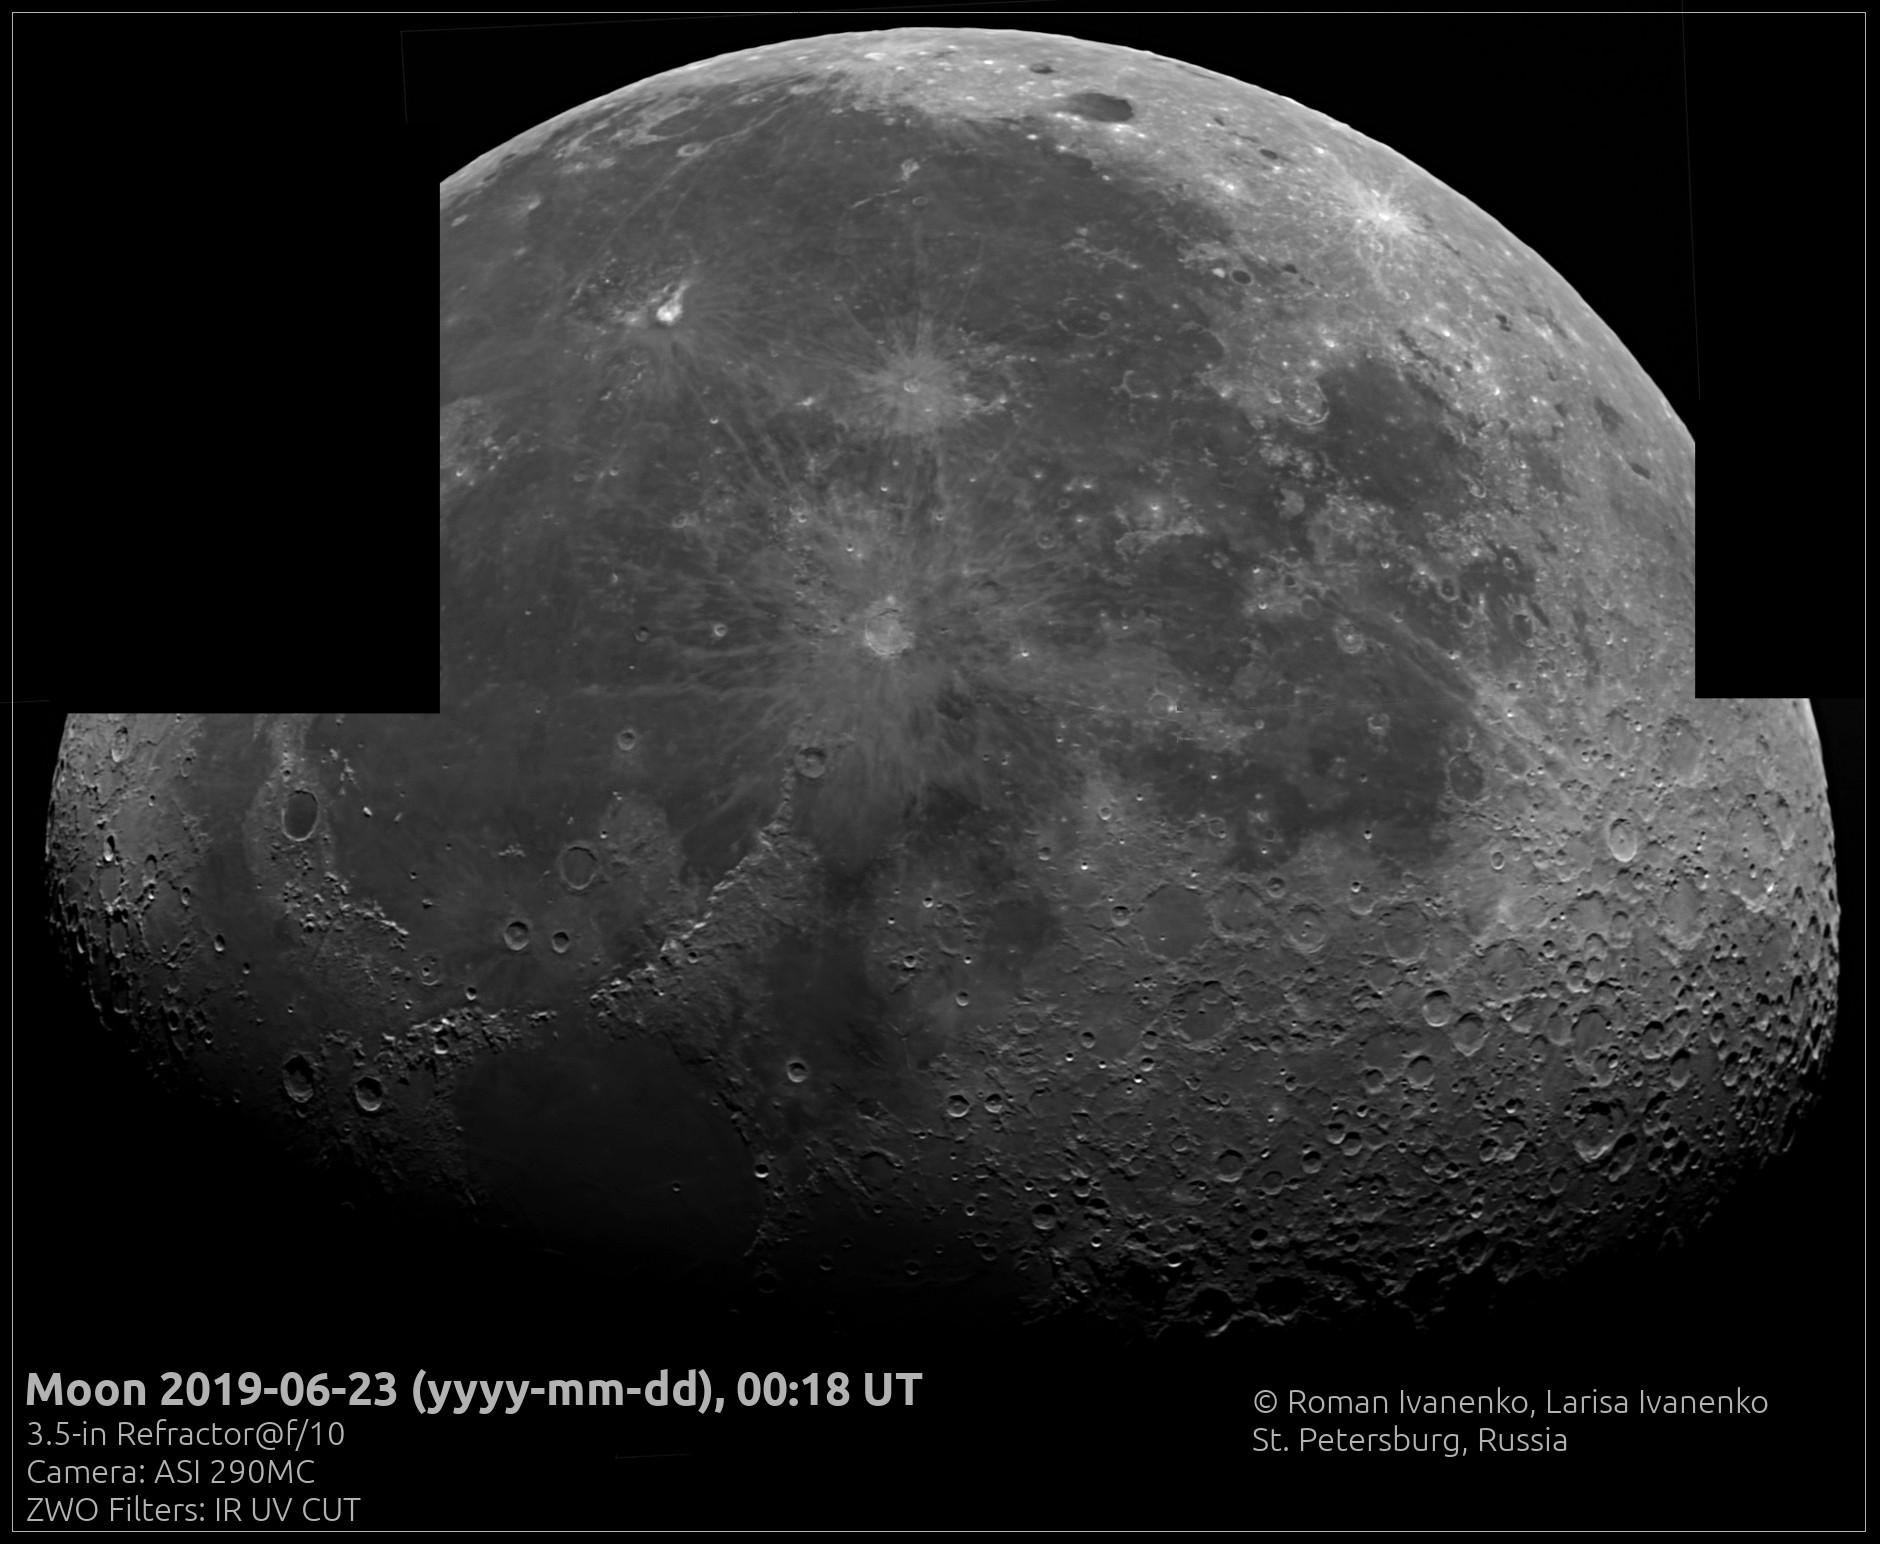 Фото Луны 23 июня 2019 года